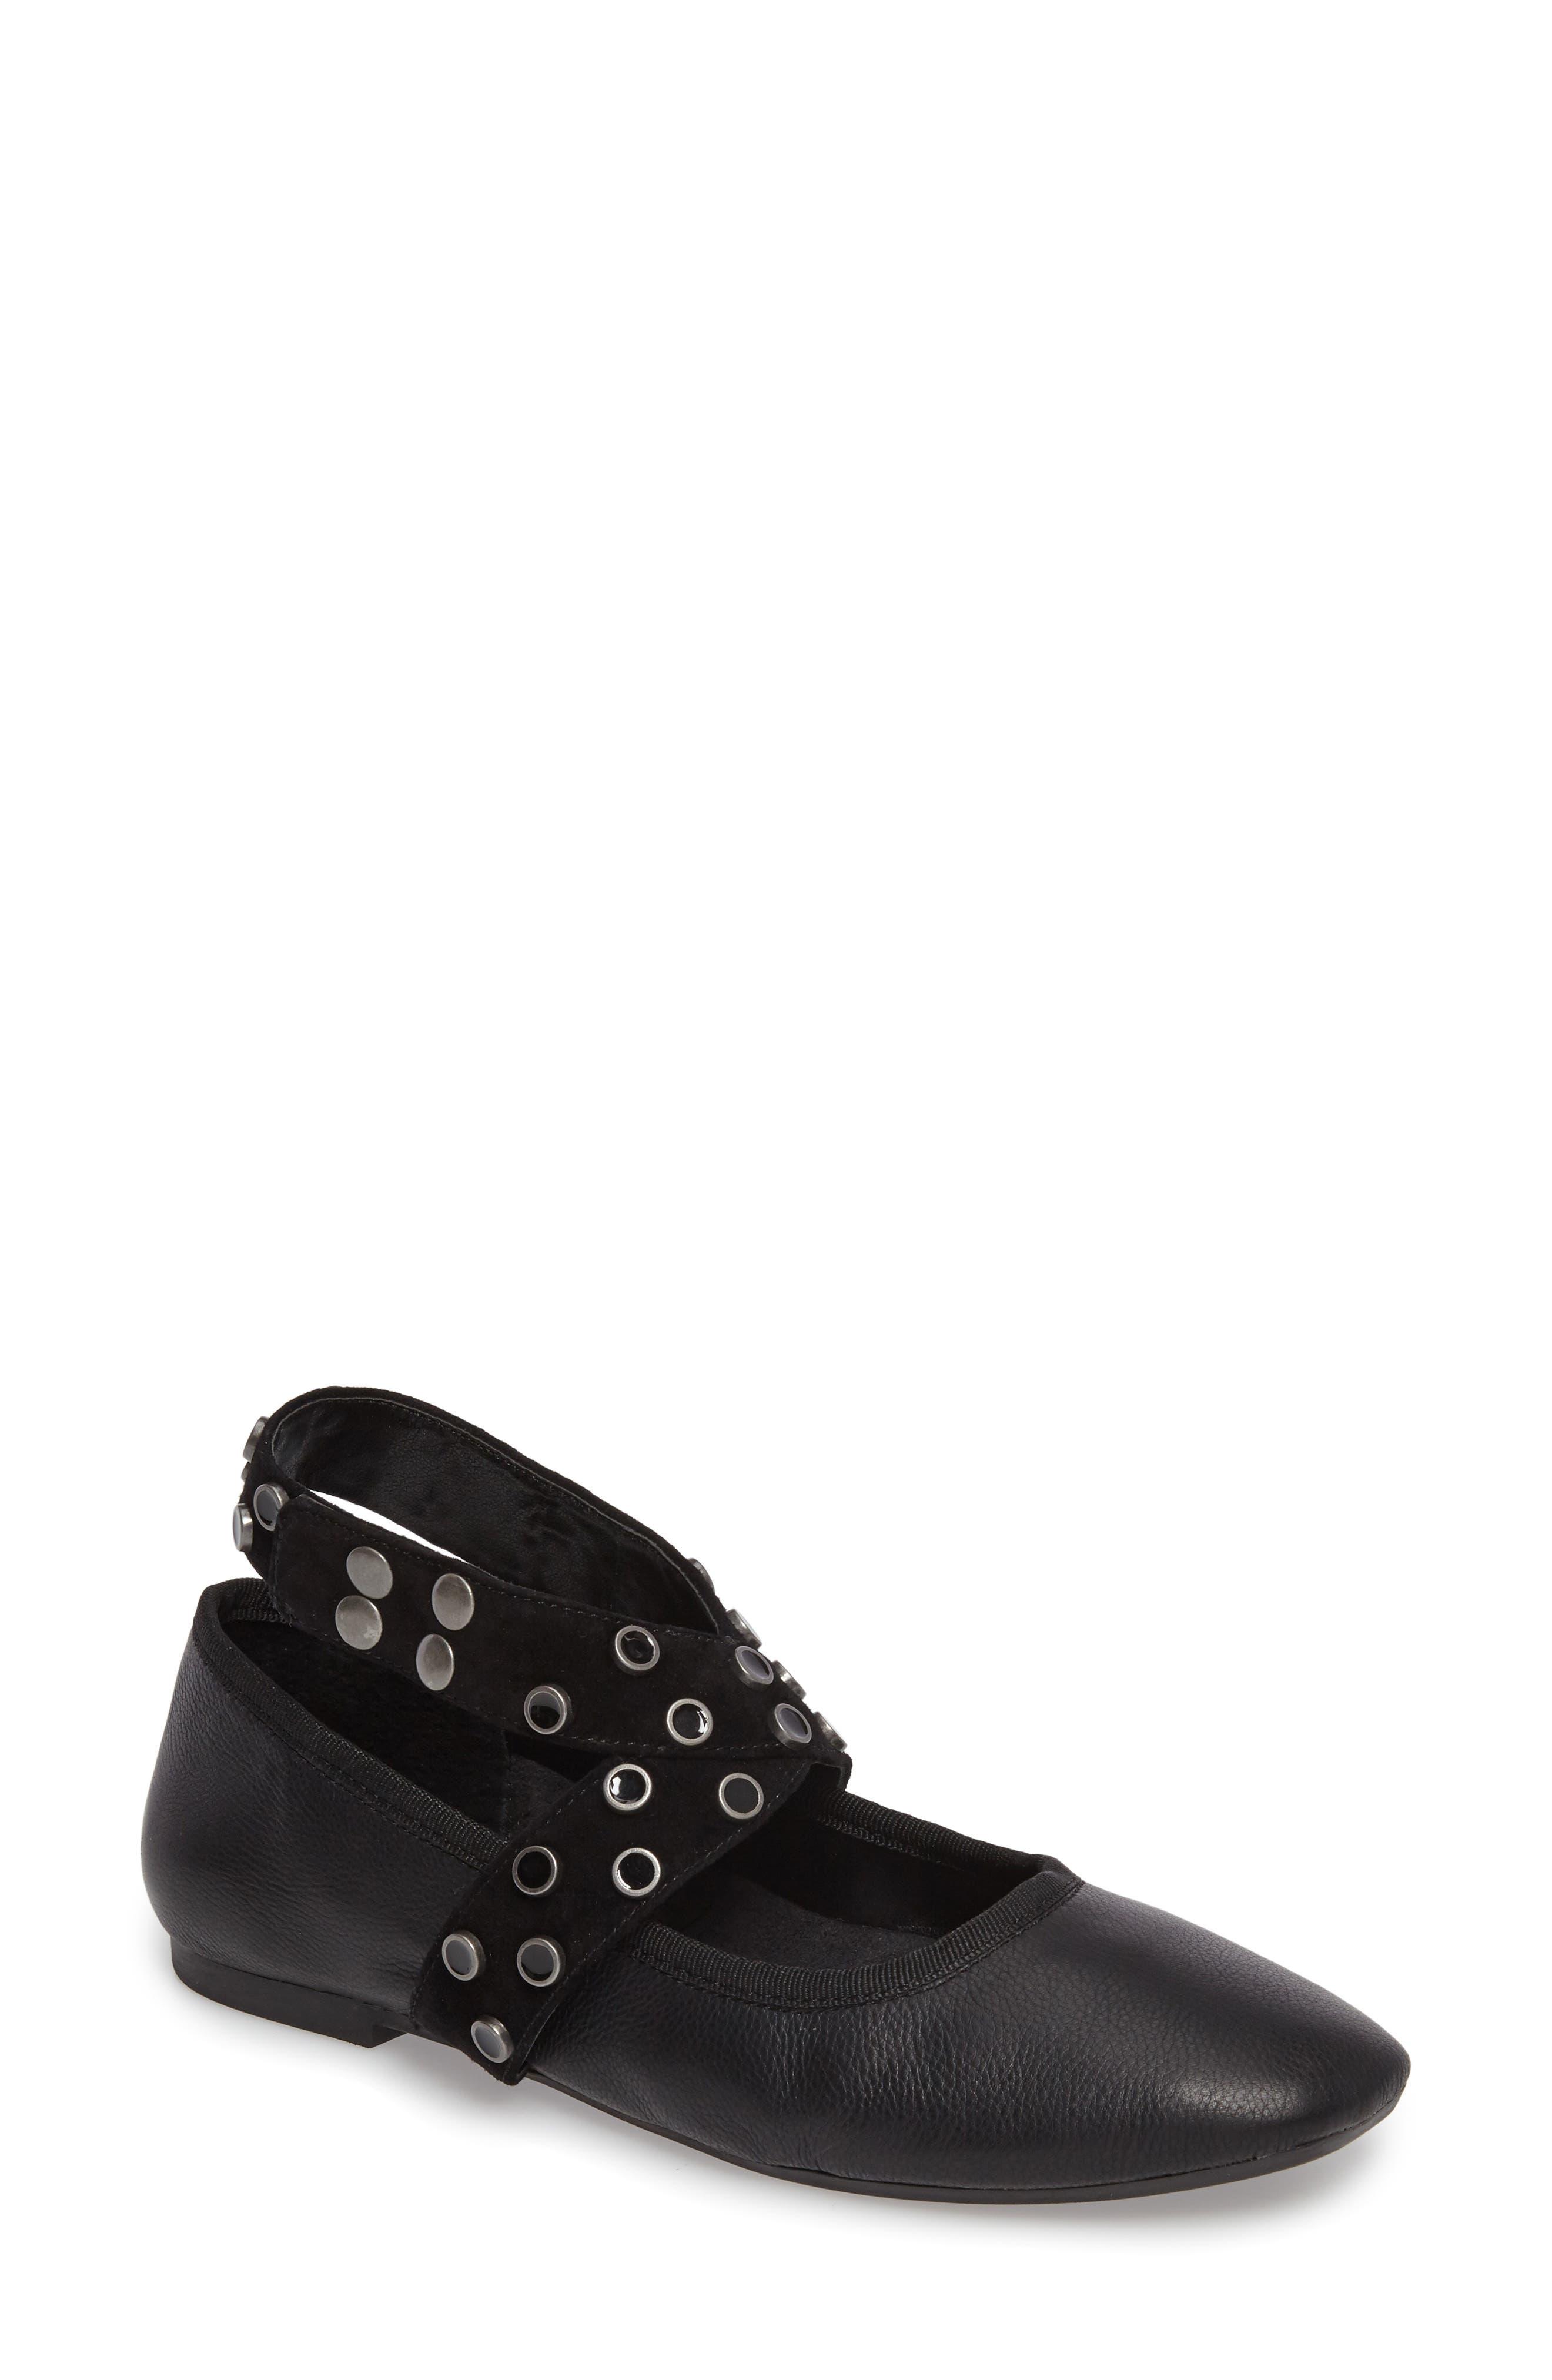 M4D3 Carla Wraparound Ankle Strap Flat,                         Main,                         color, 001